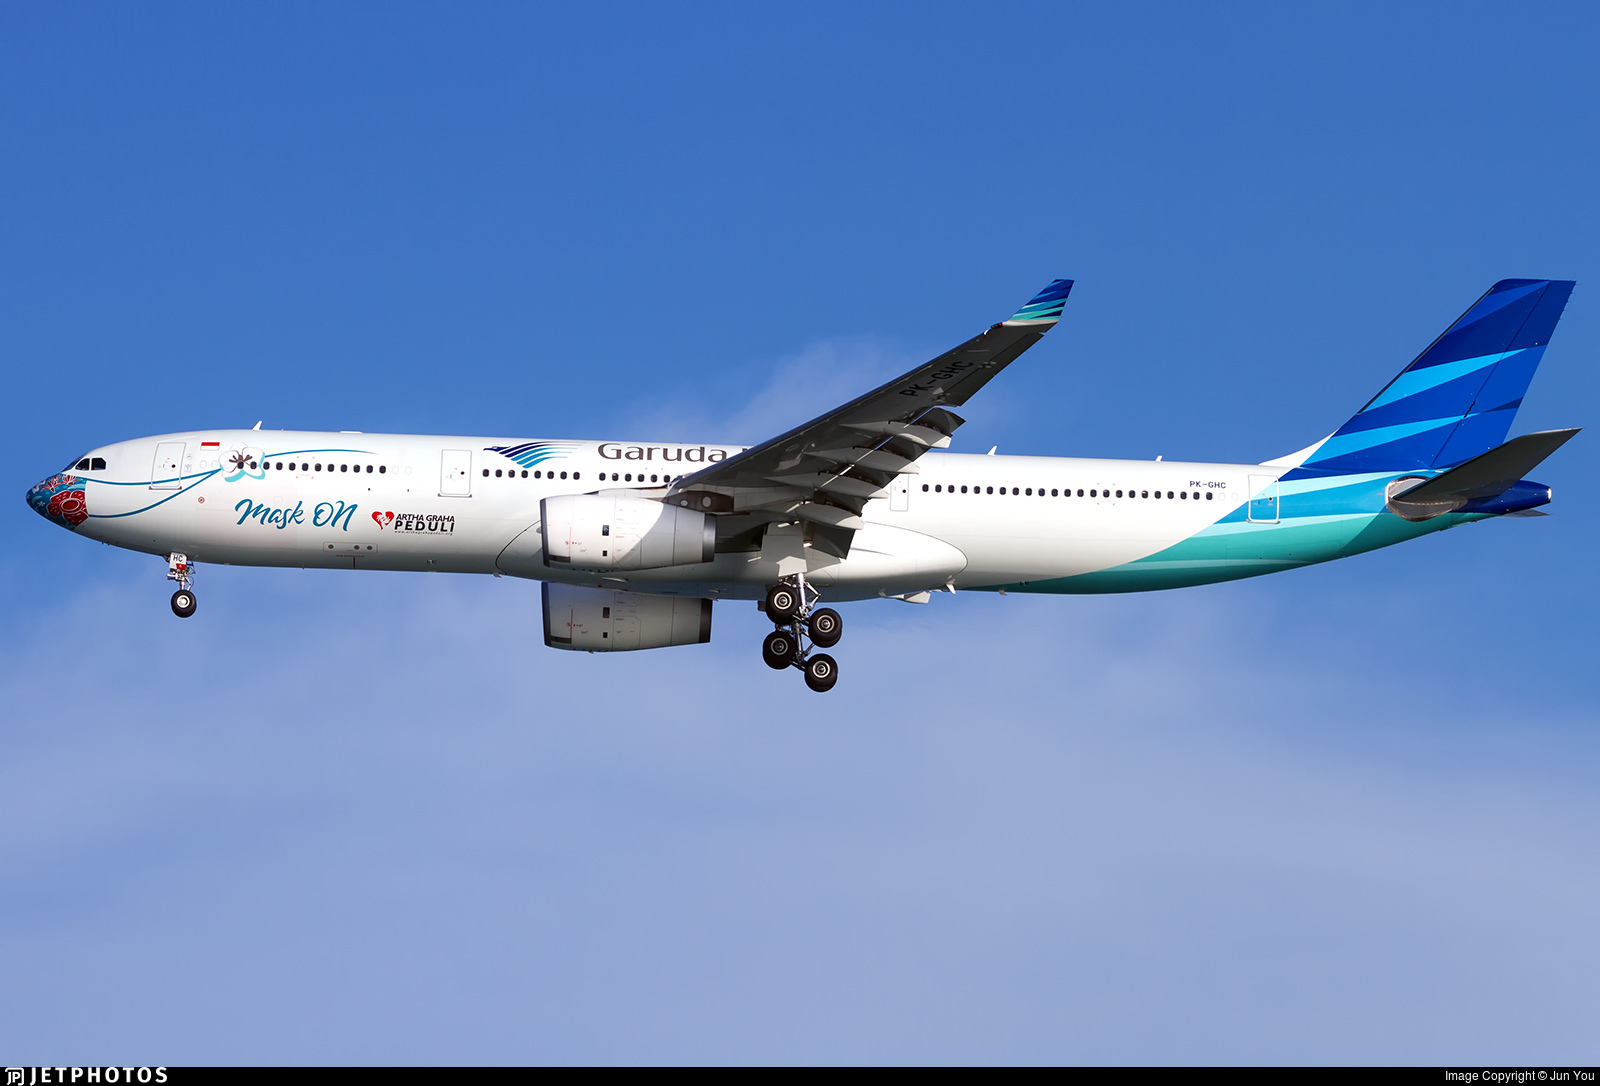 Garuda's 'Mask On' A330